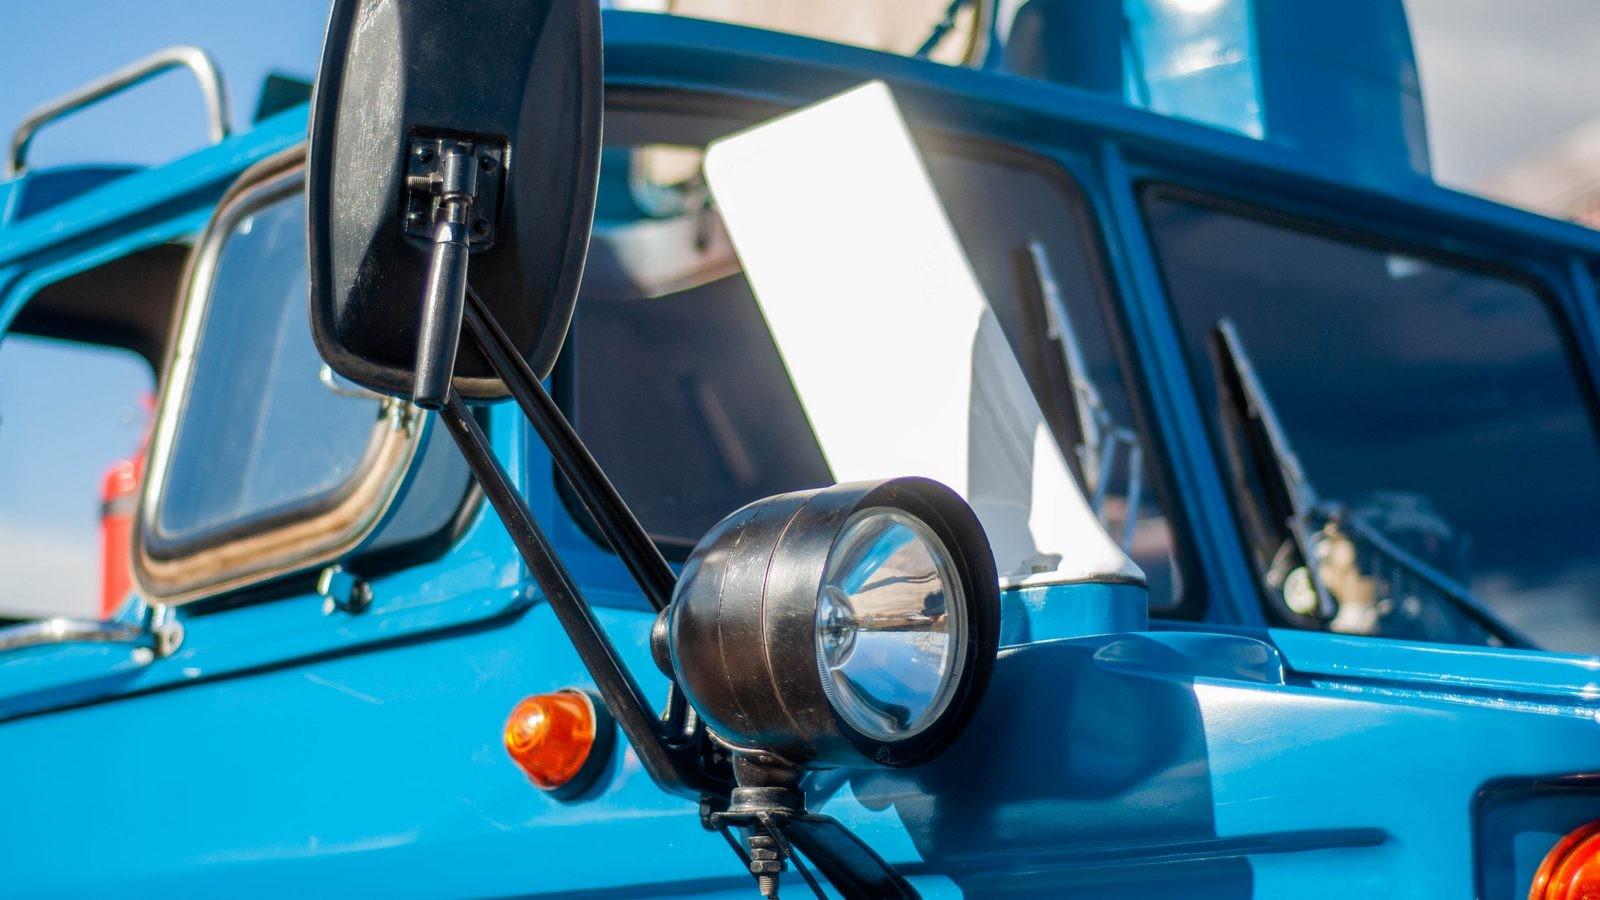 ЗИЛ-49061 Синяя Птица правое зеркало (2)